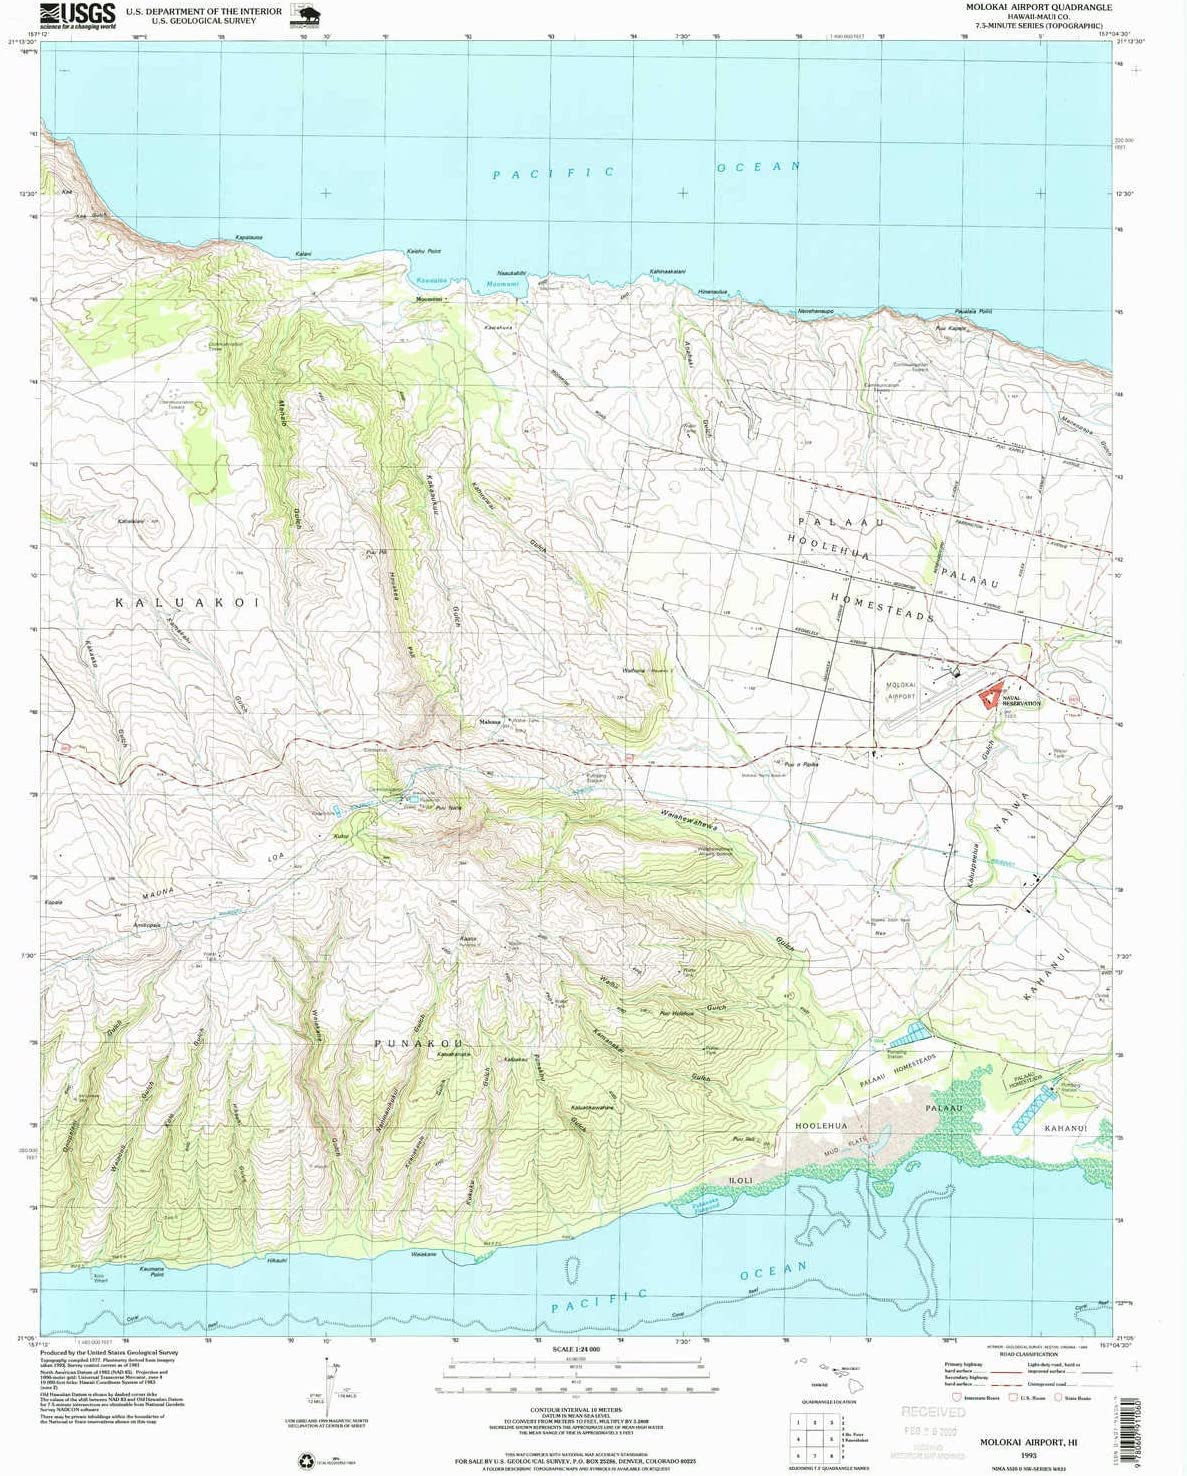 YellowMaps Molokai Airport HI topo map Scale 返品不可 オンラインショッピング 7.5 X 1:24000